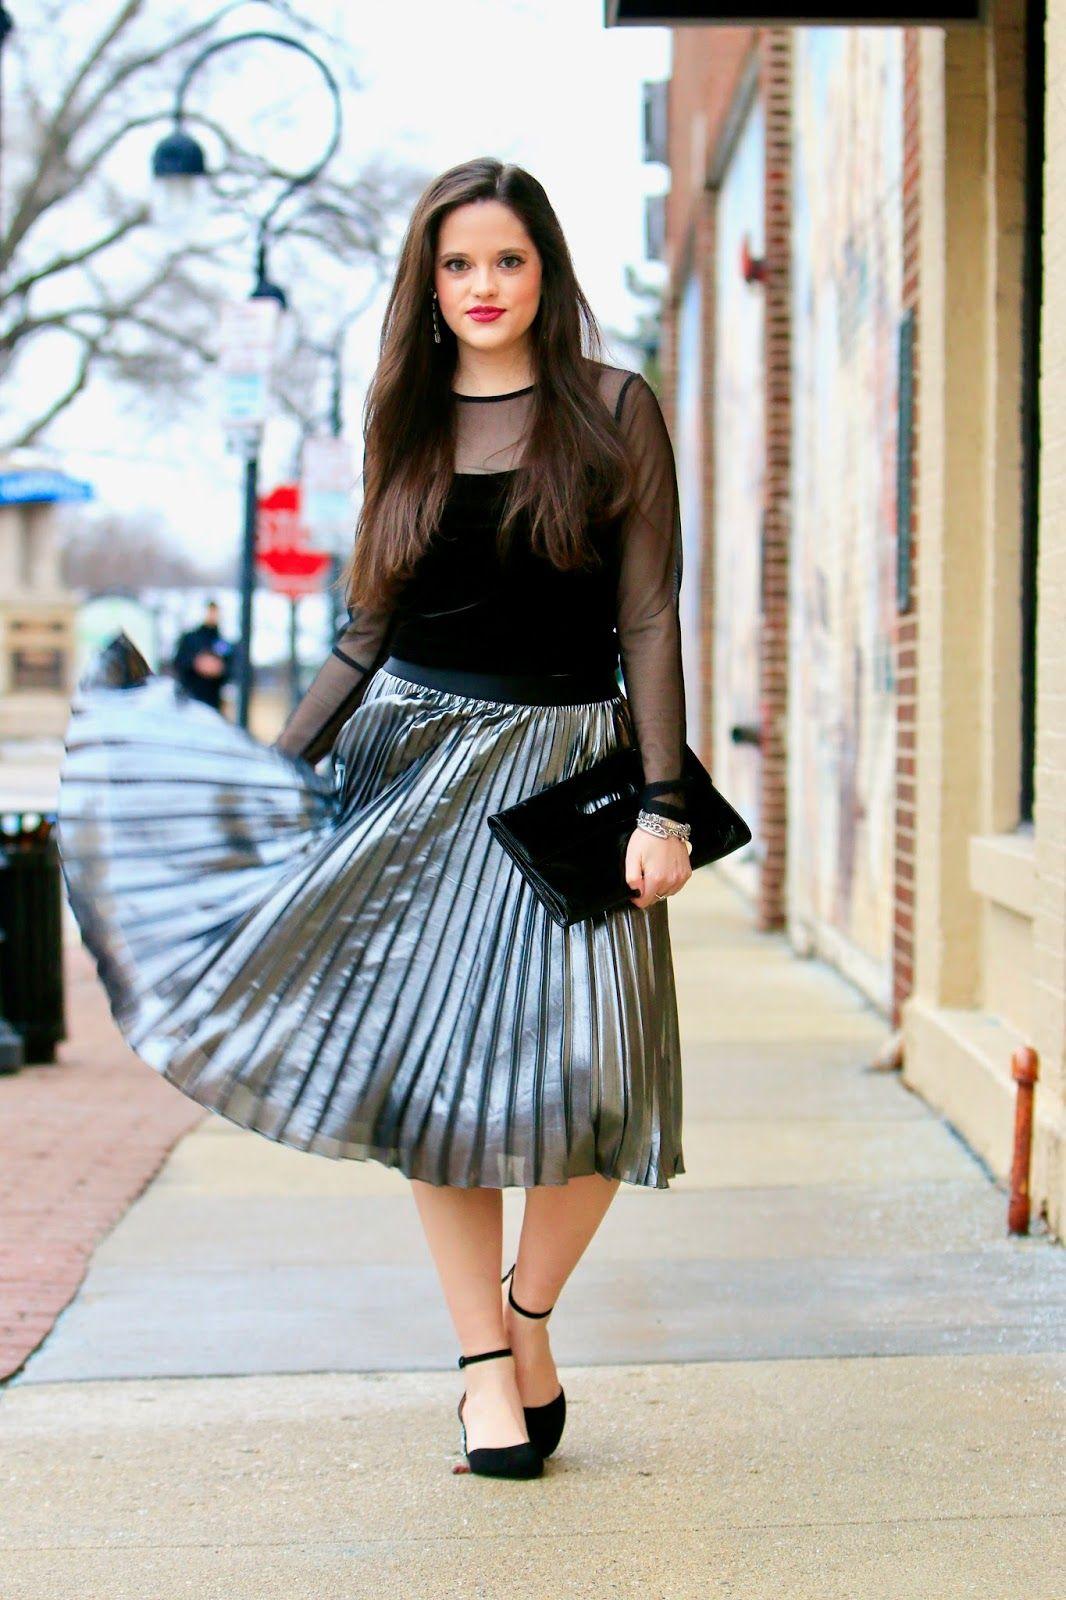 Silver Stunner // Metallic Pleated Skirt Velvet Crop Top | Kats Fashion Fix_blog | Pinterest ...